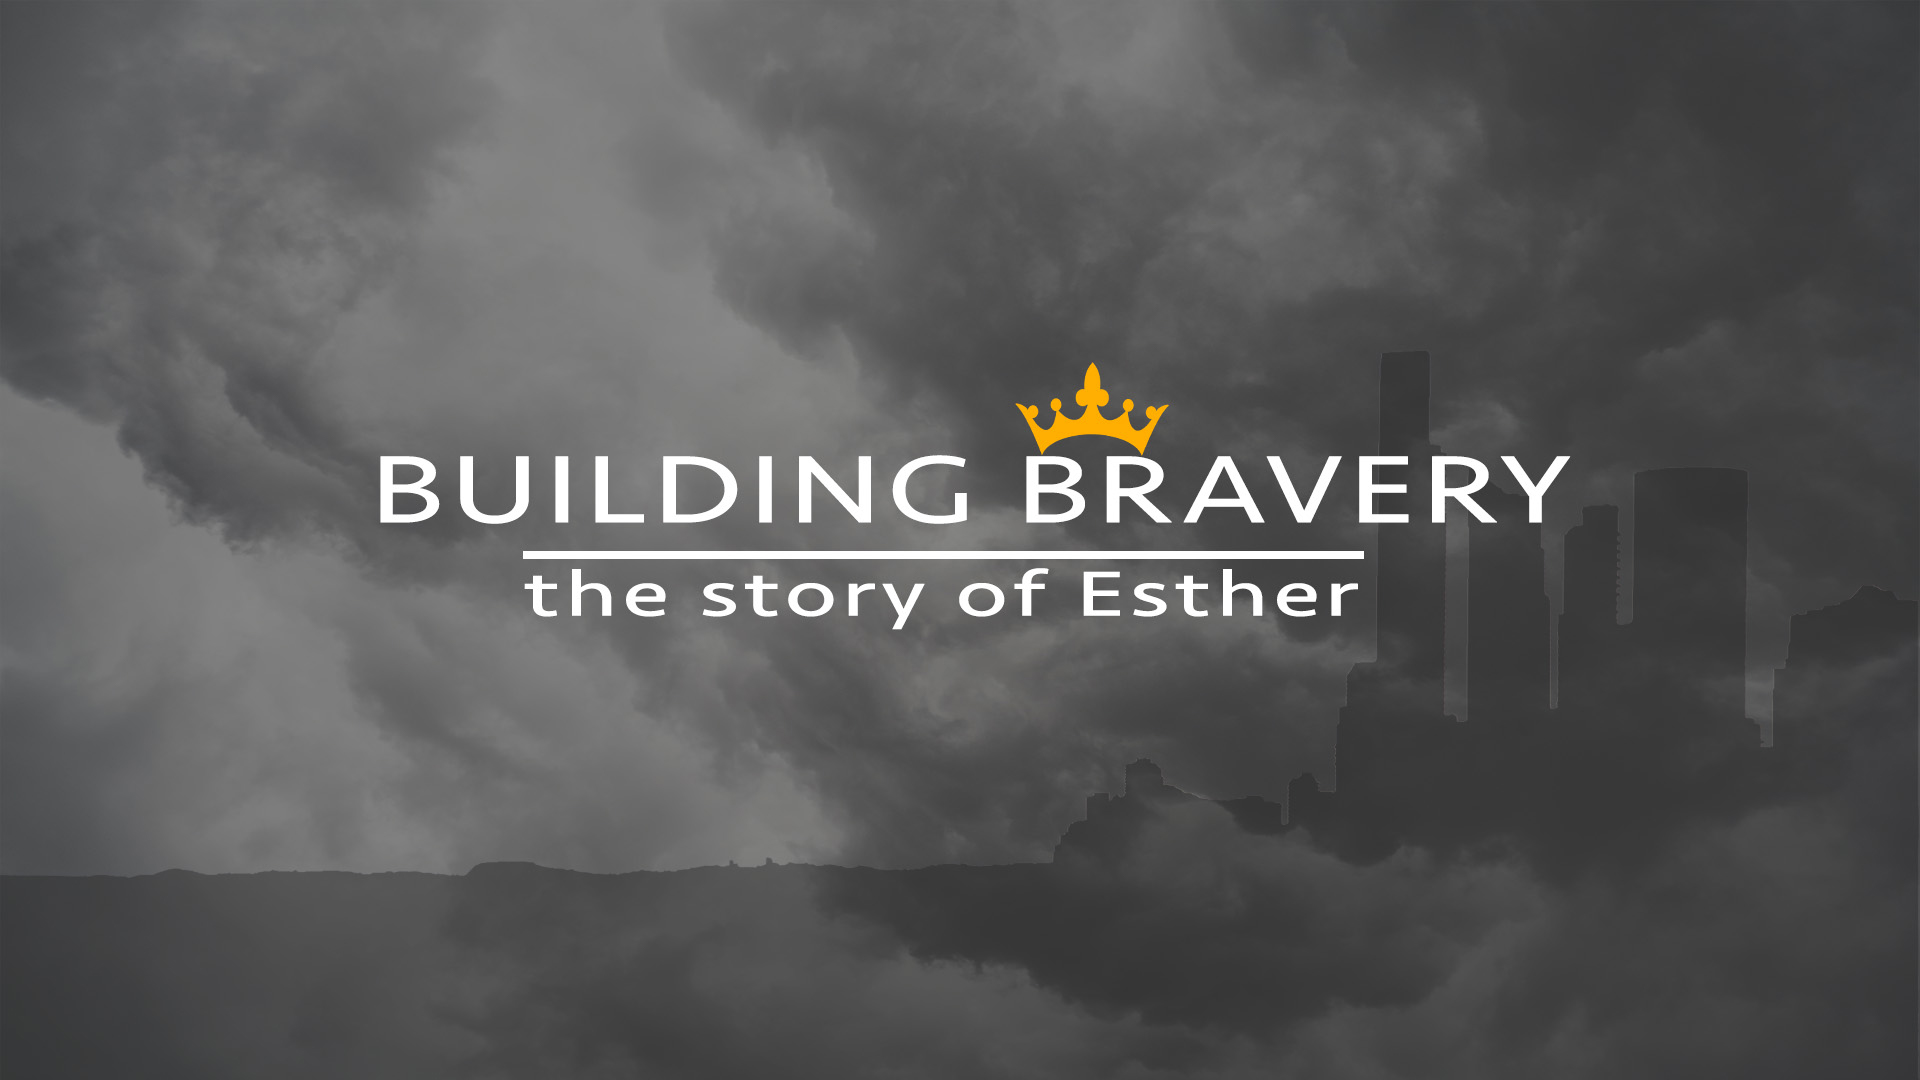 Building Bravery